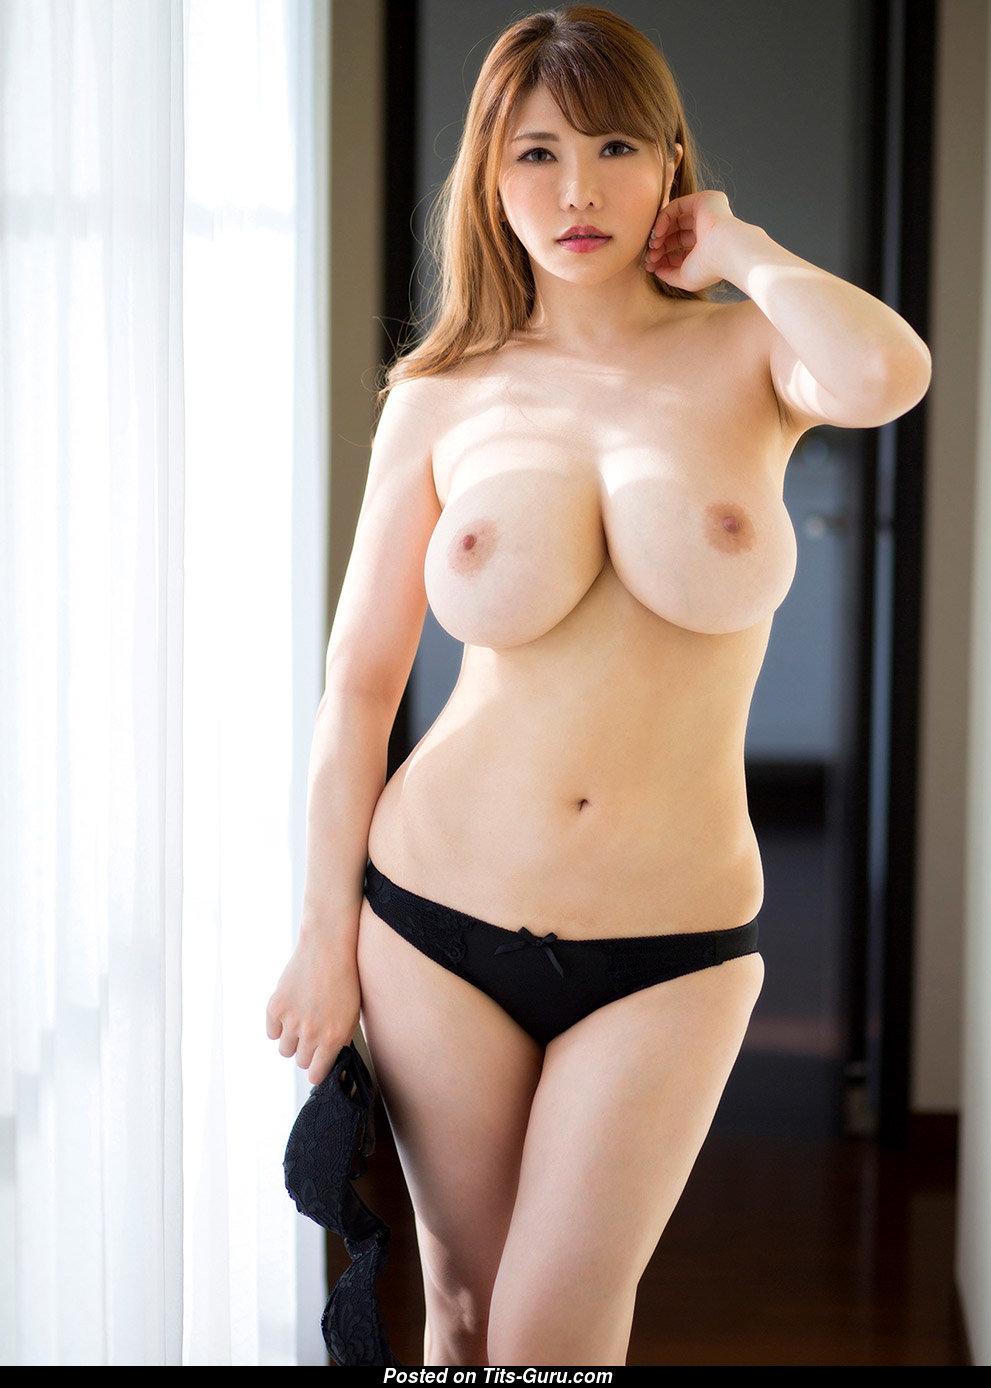 Angelique Pettyjohn Topless anri okita - topless asian brunette pornstar & babe with